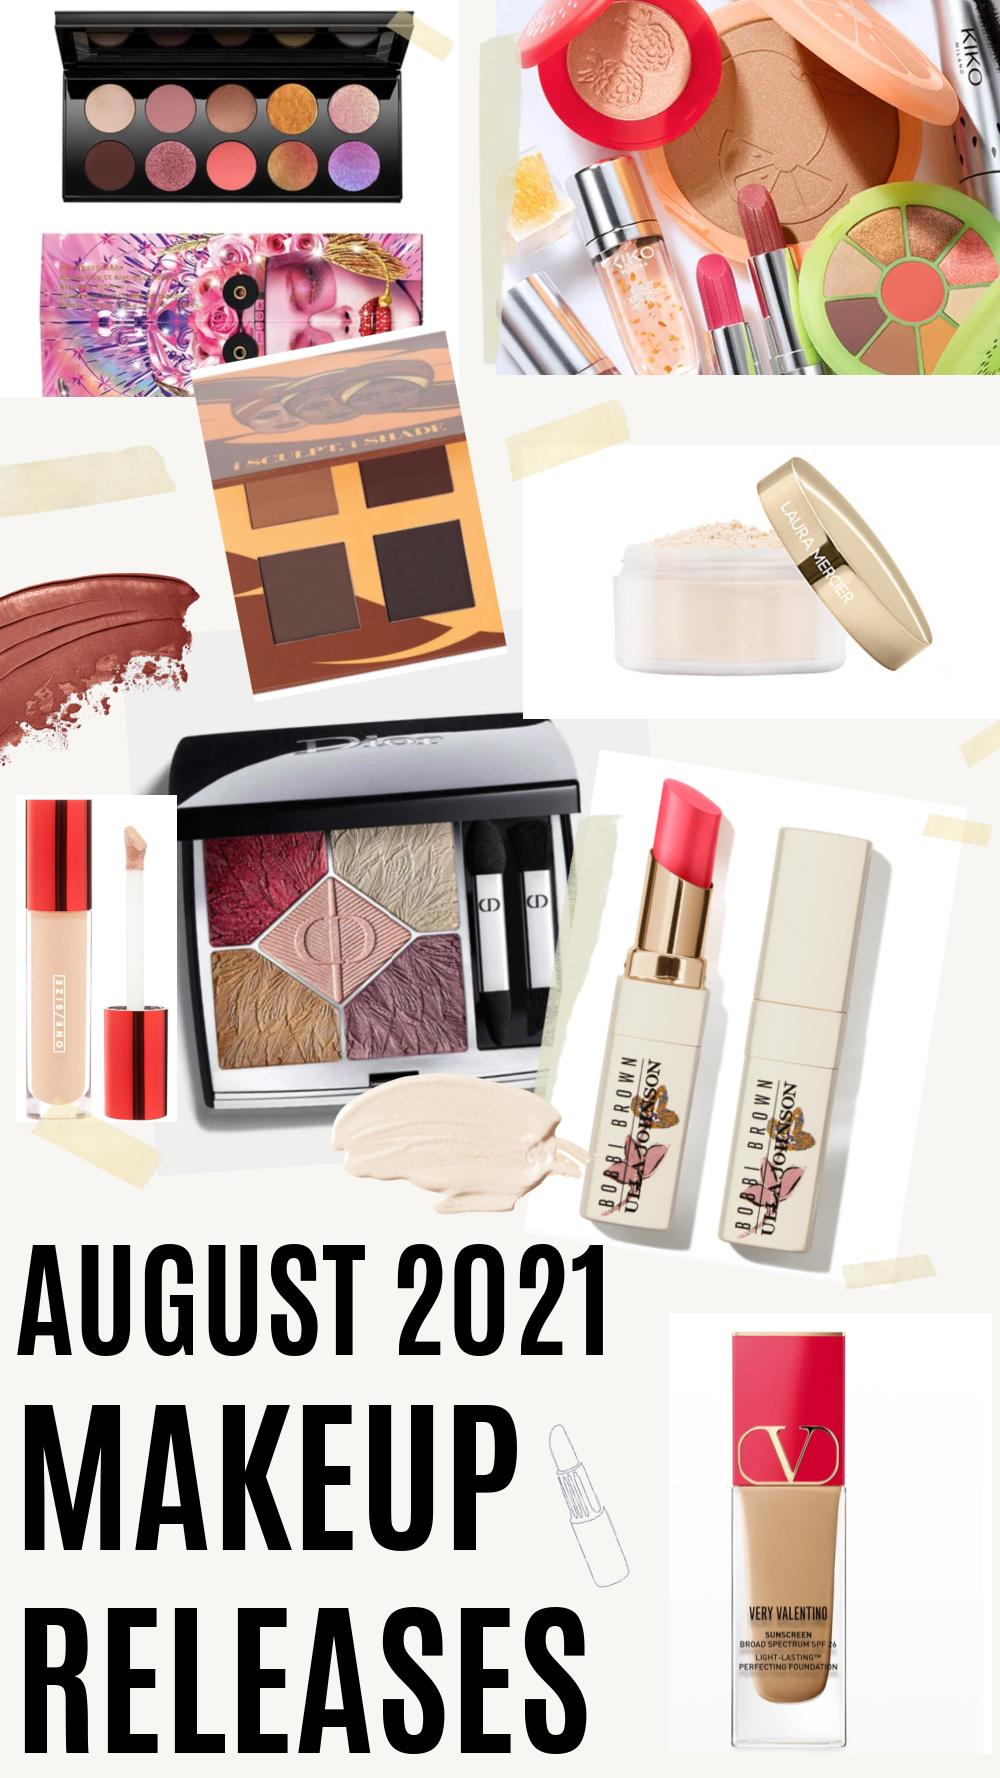 August 2021 Makeup Release I DreaminLace.com #makeupaddict #beautytips #beautyblog